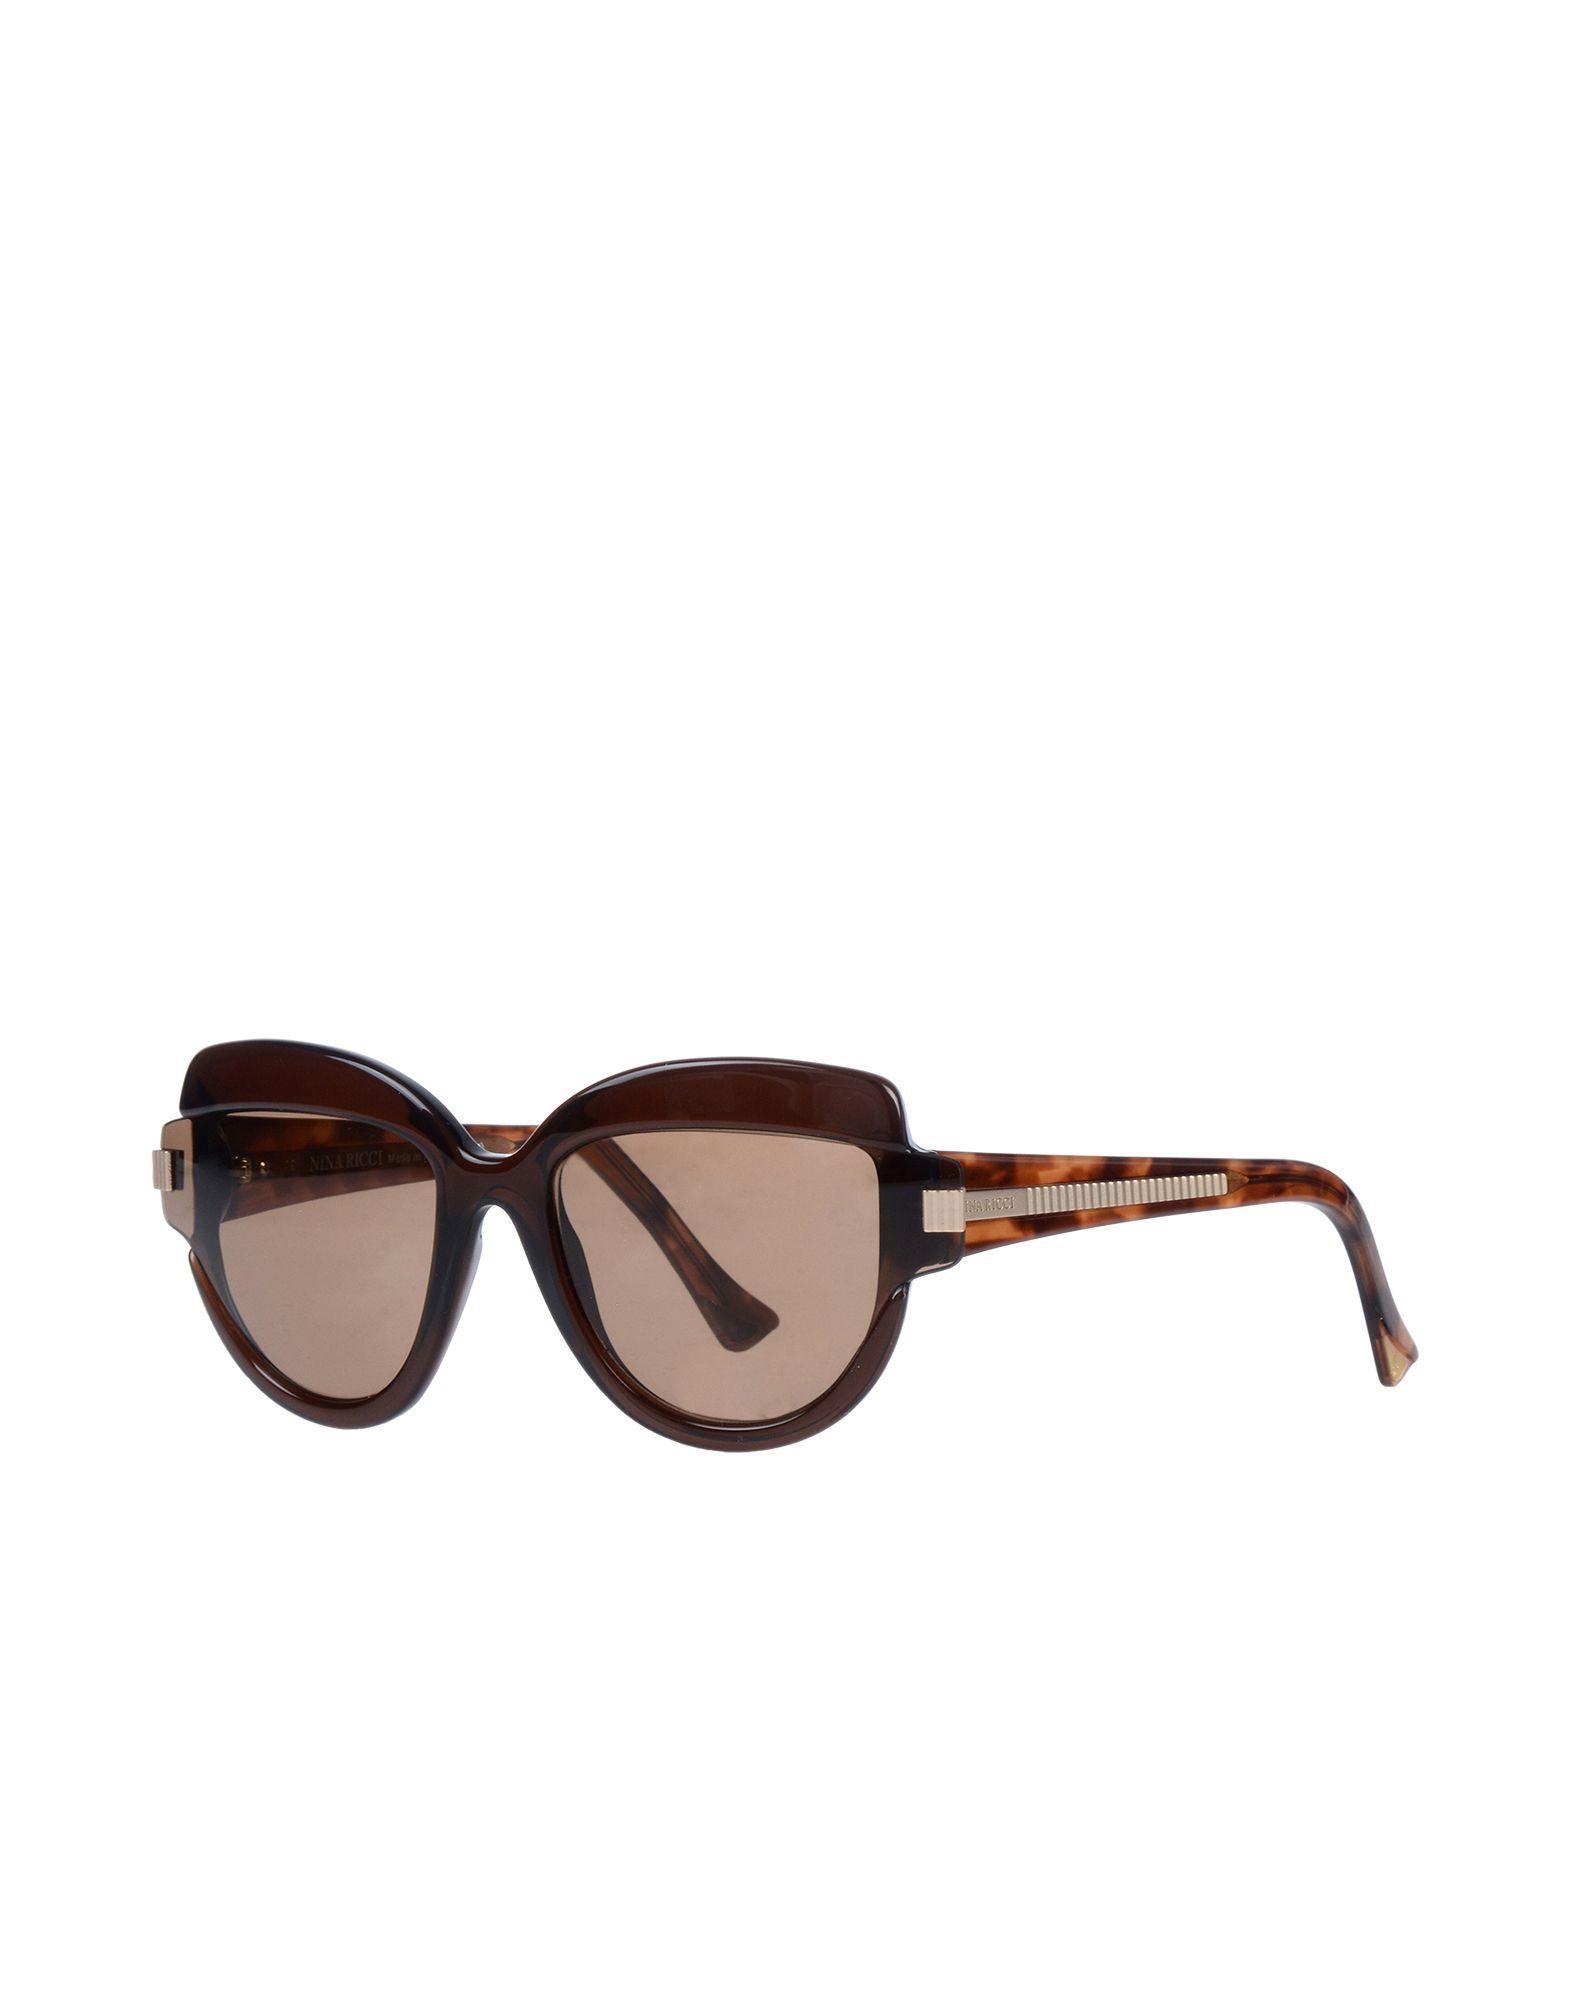 Фото - NINA RICCI Солнечные очки 3d очки